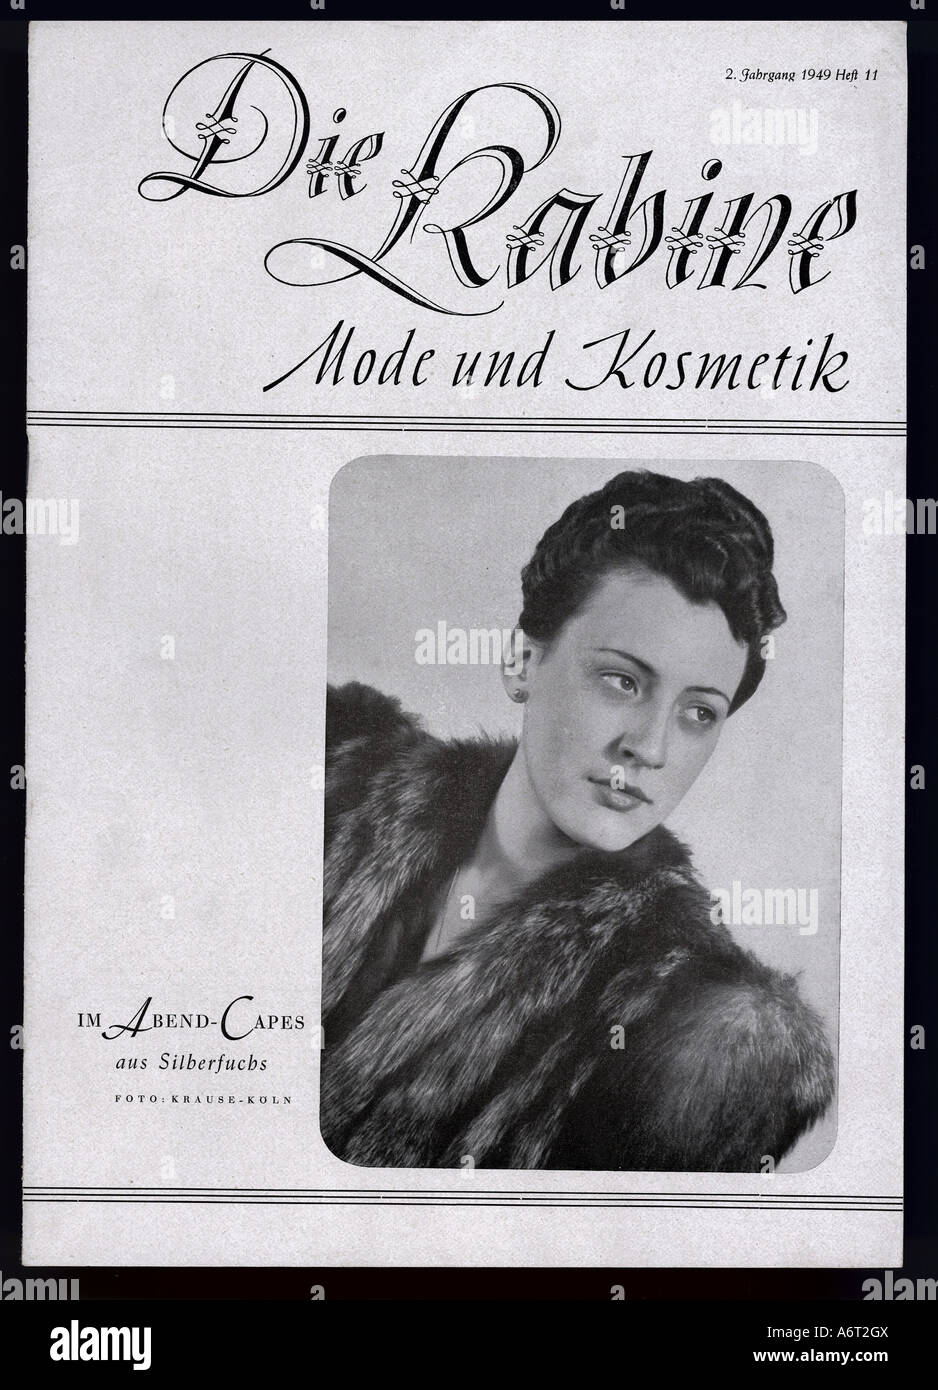 magazines/newspapers, 'Die Kabine', 2nd volume, number 11, 1949, Germany, fashion, cosmetics, magazine, - Stock Image